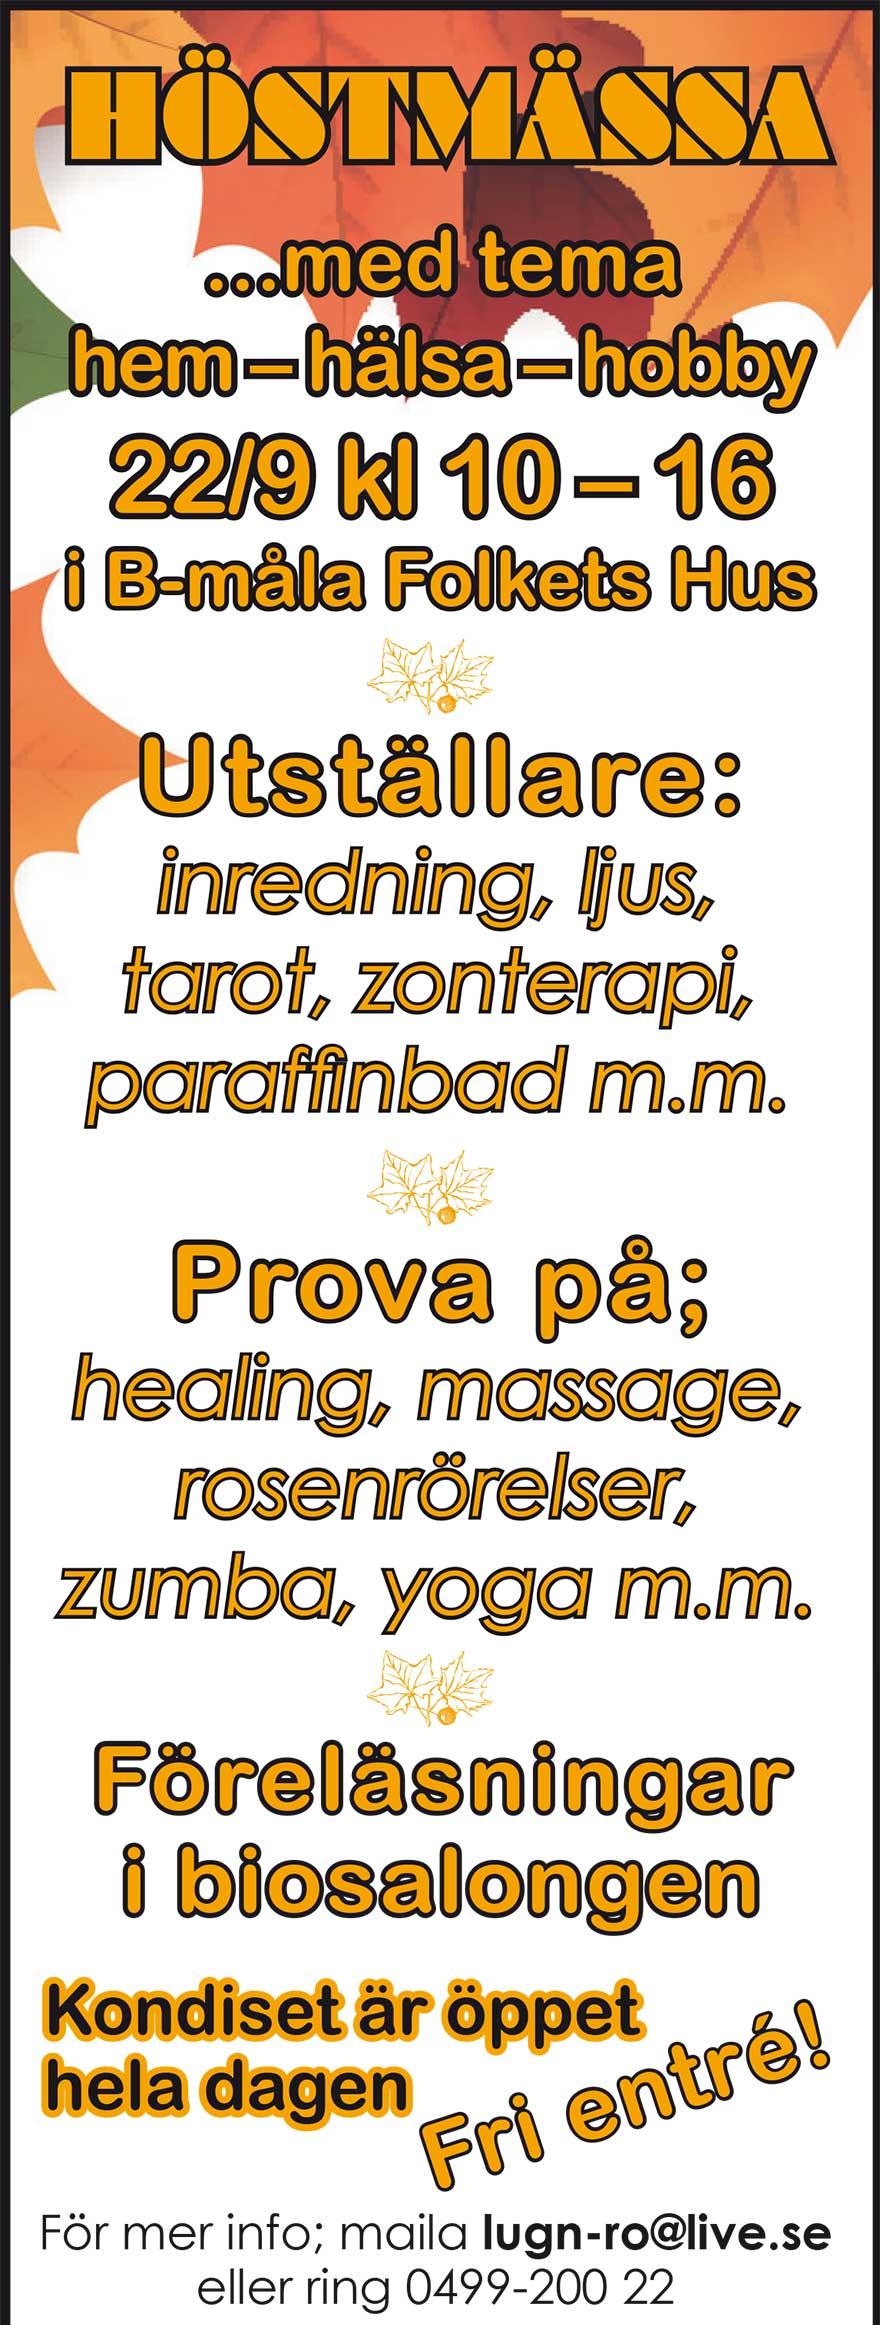 billig thaimassage massage tips hemma